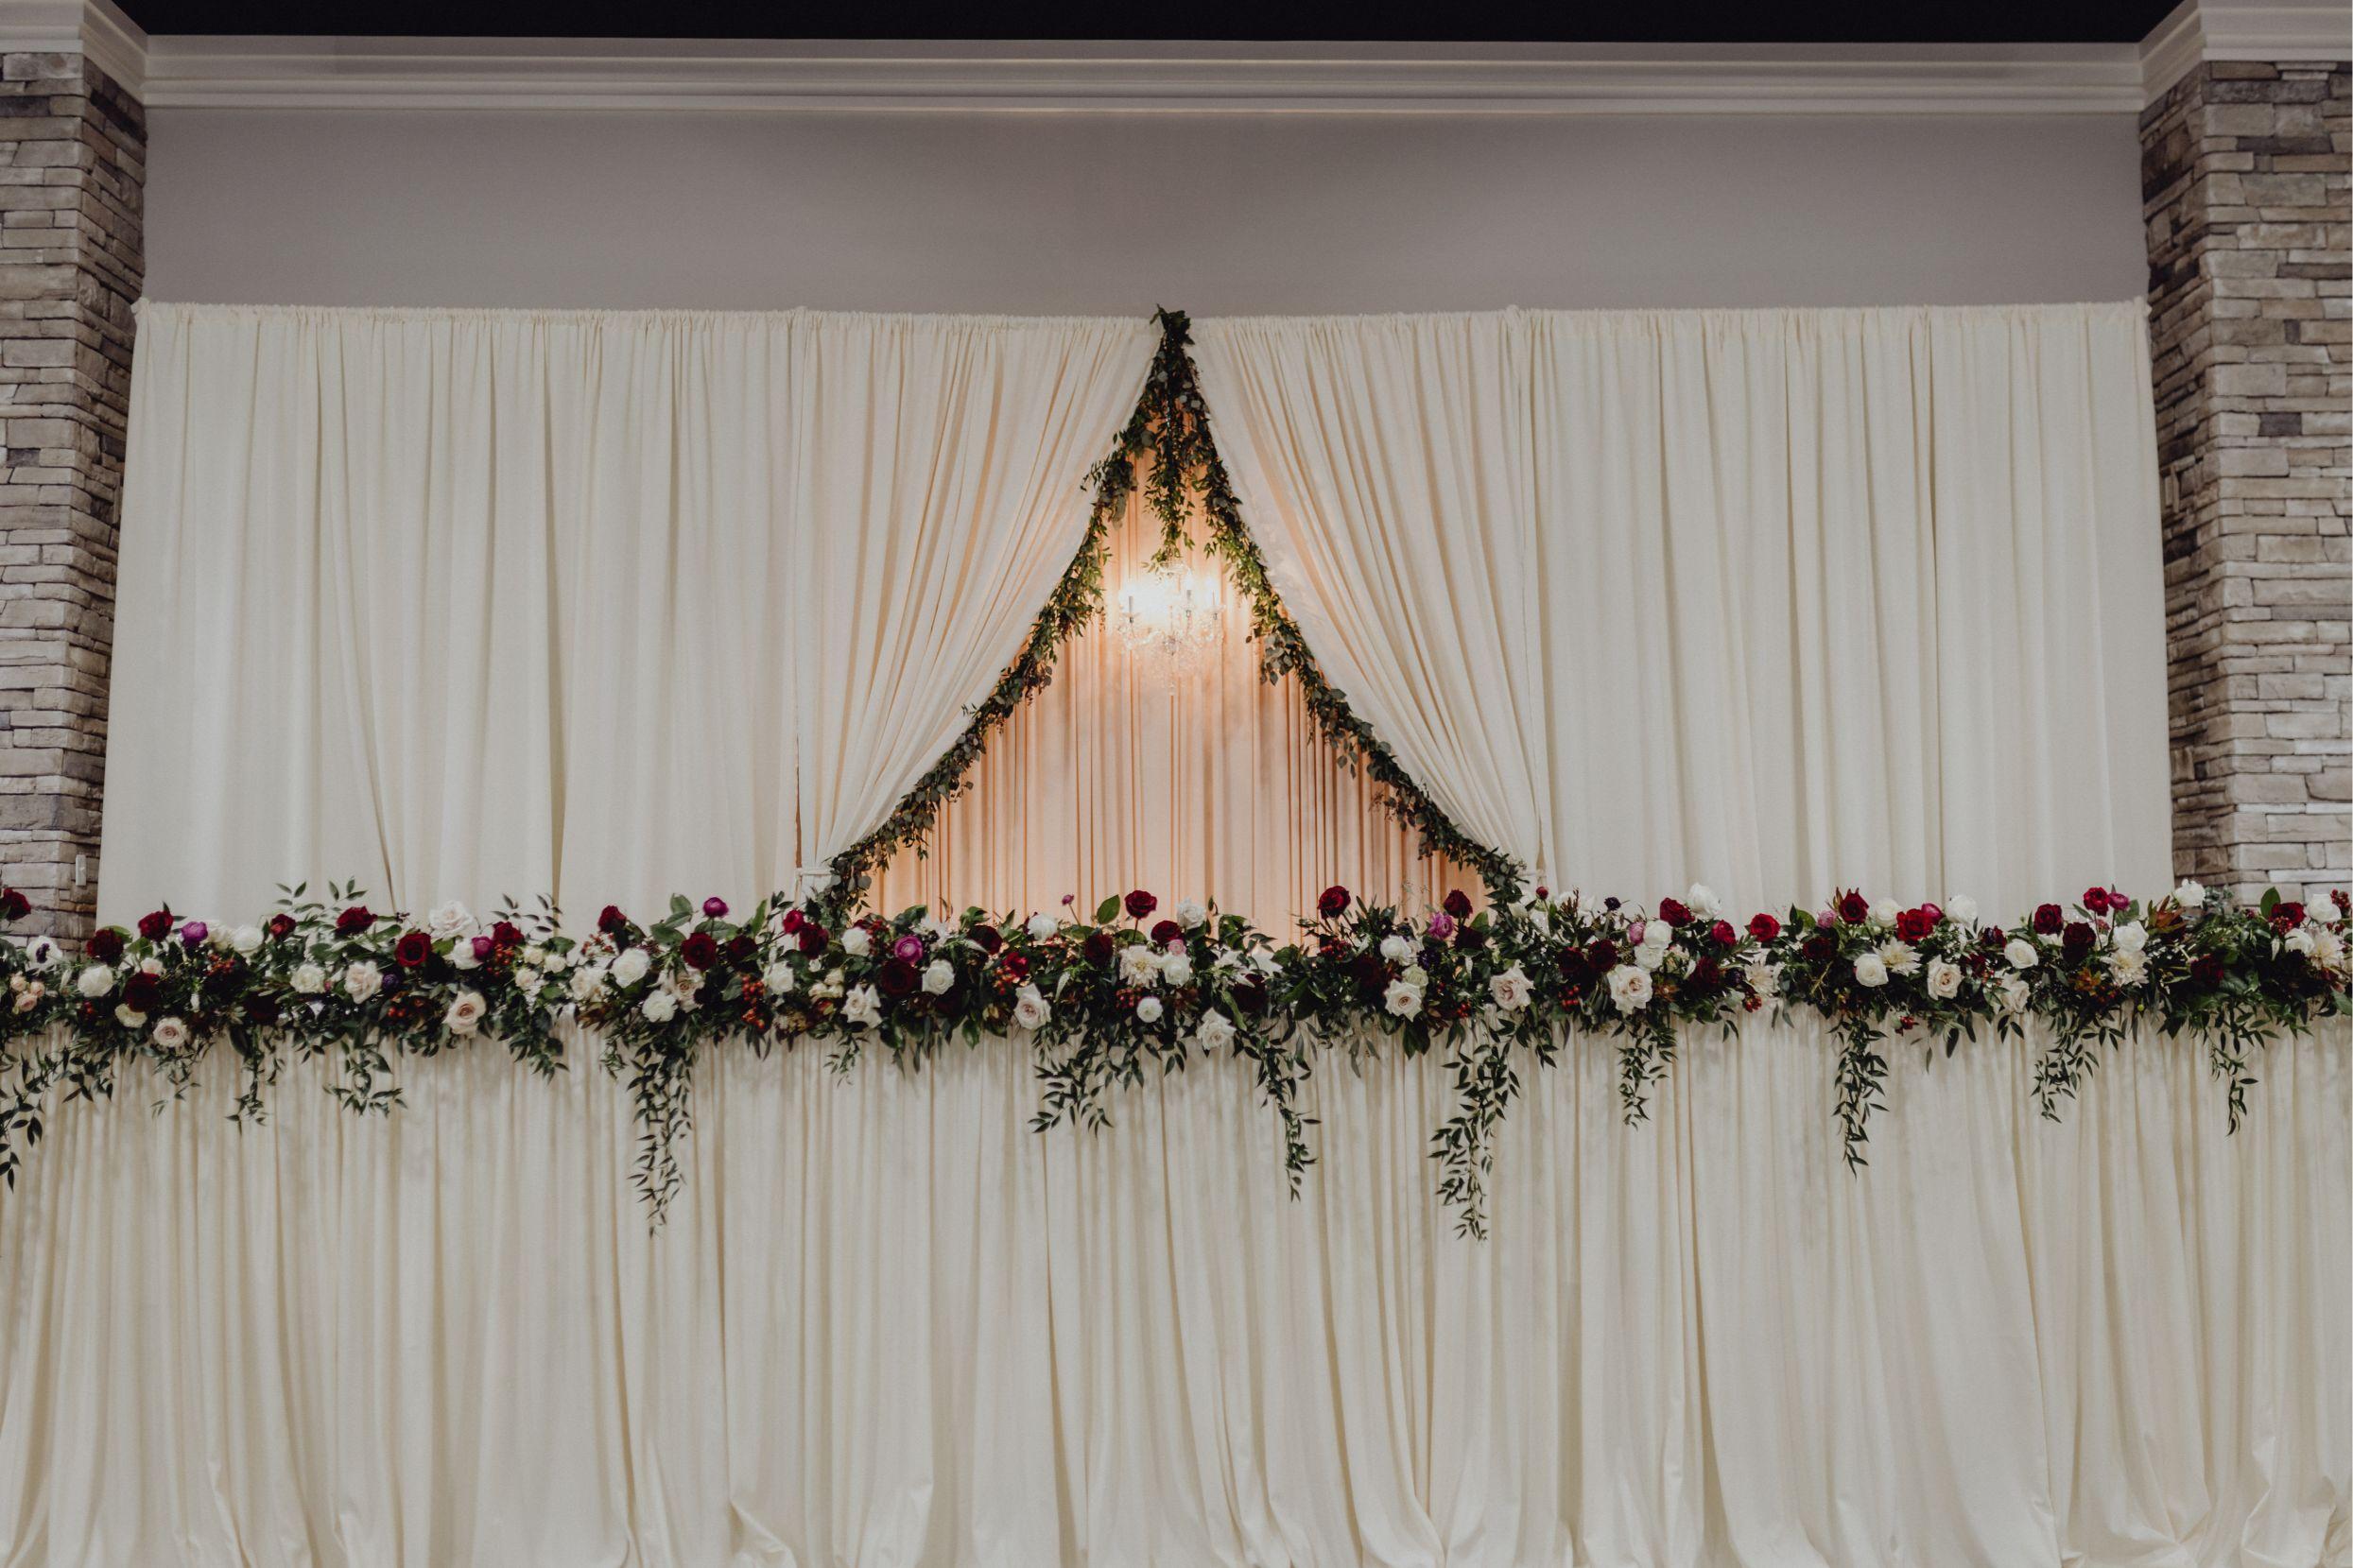 North-Dallas-Wedding-Florist-David-Co.-15.jpg